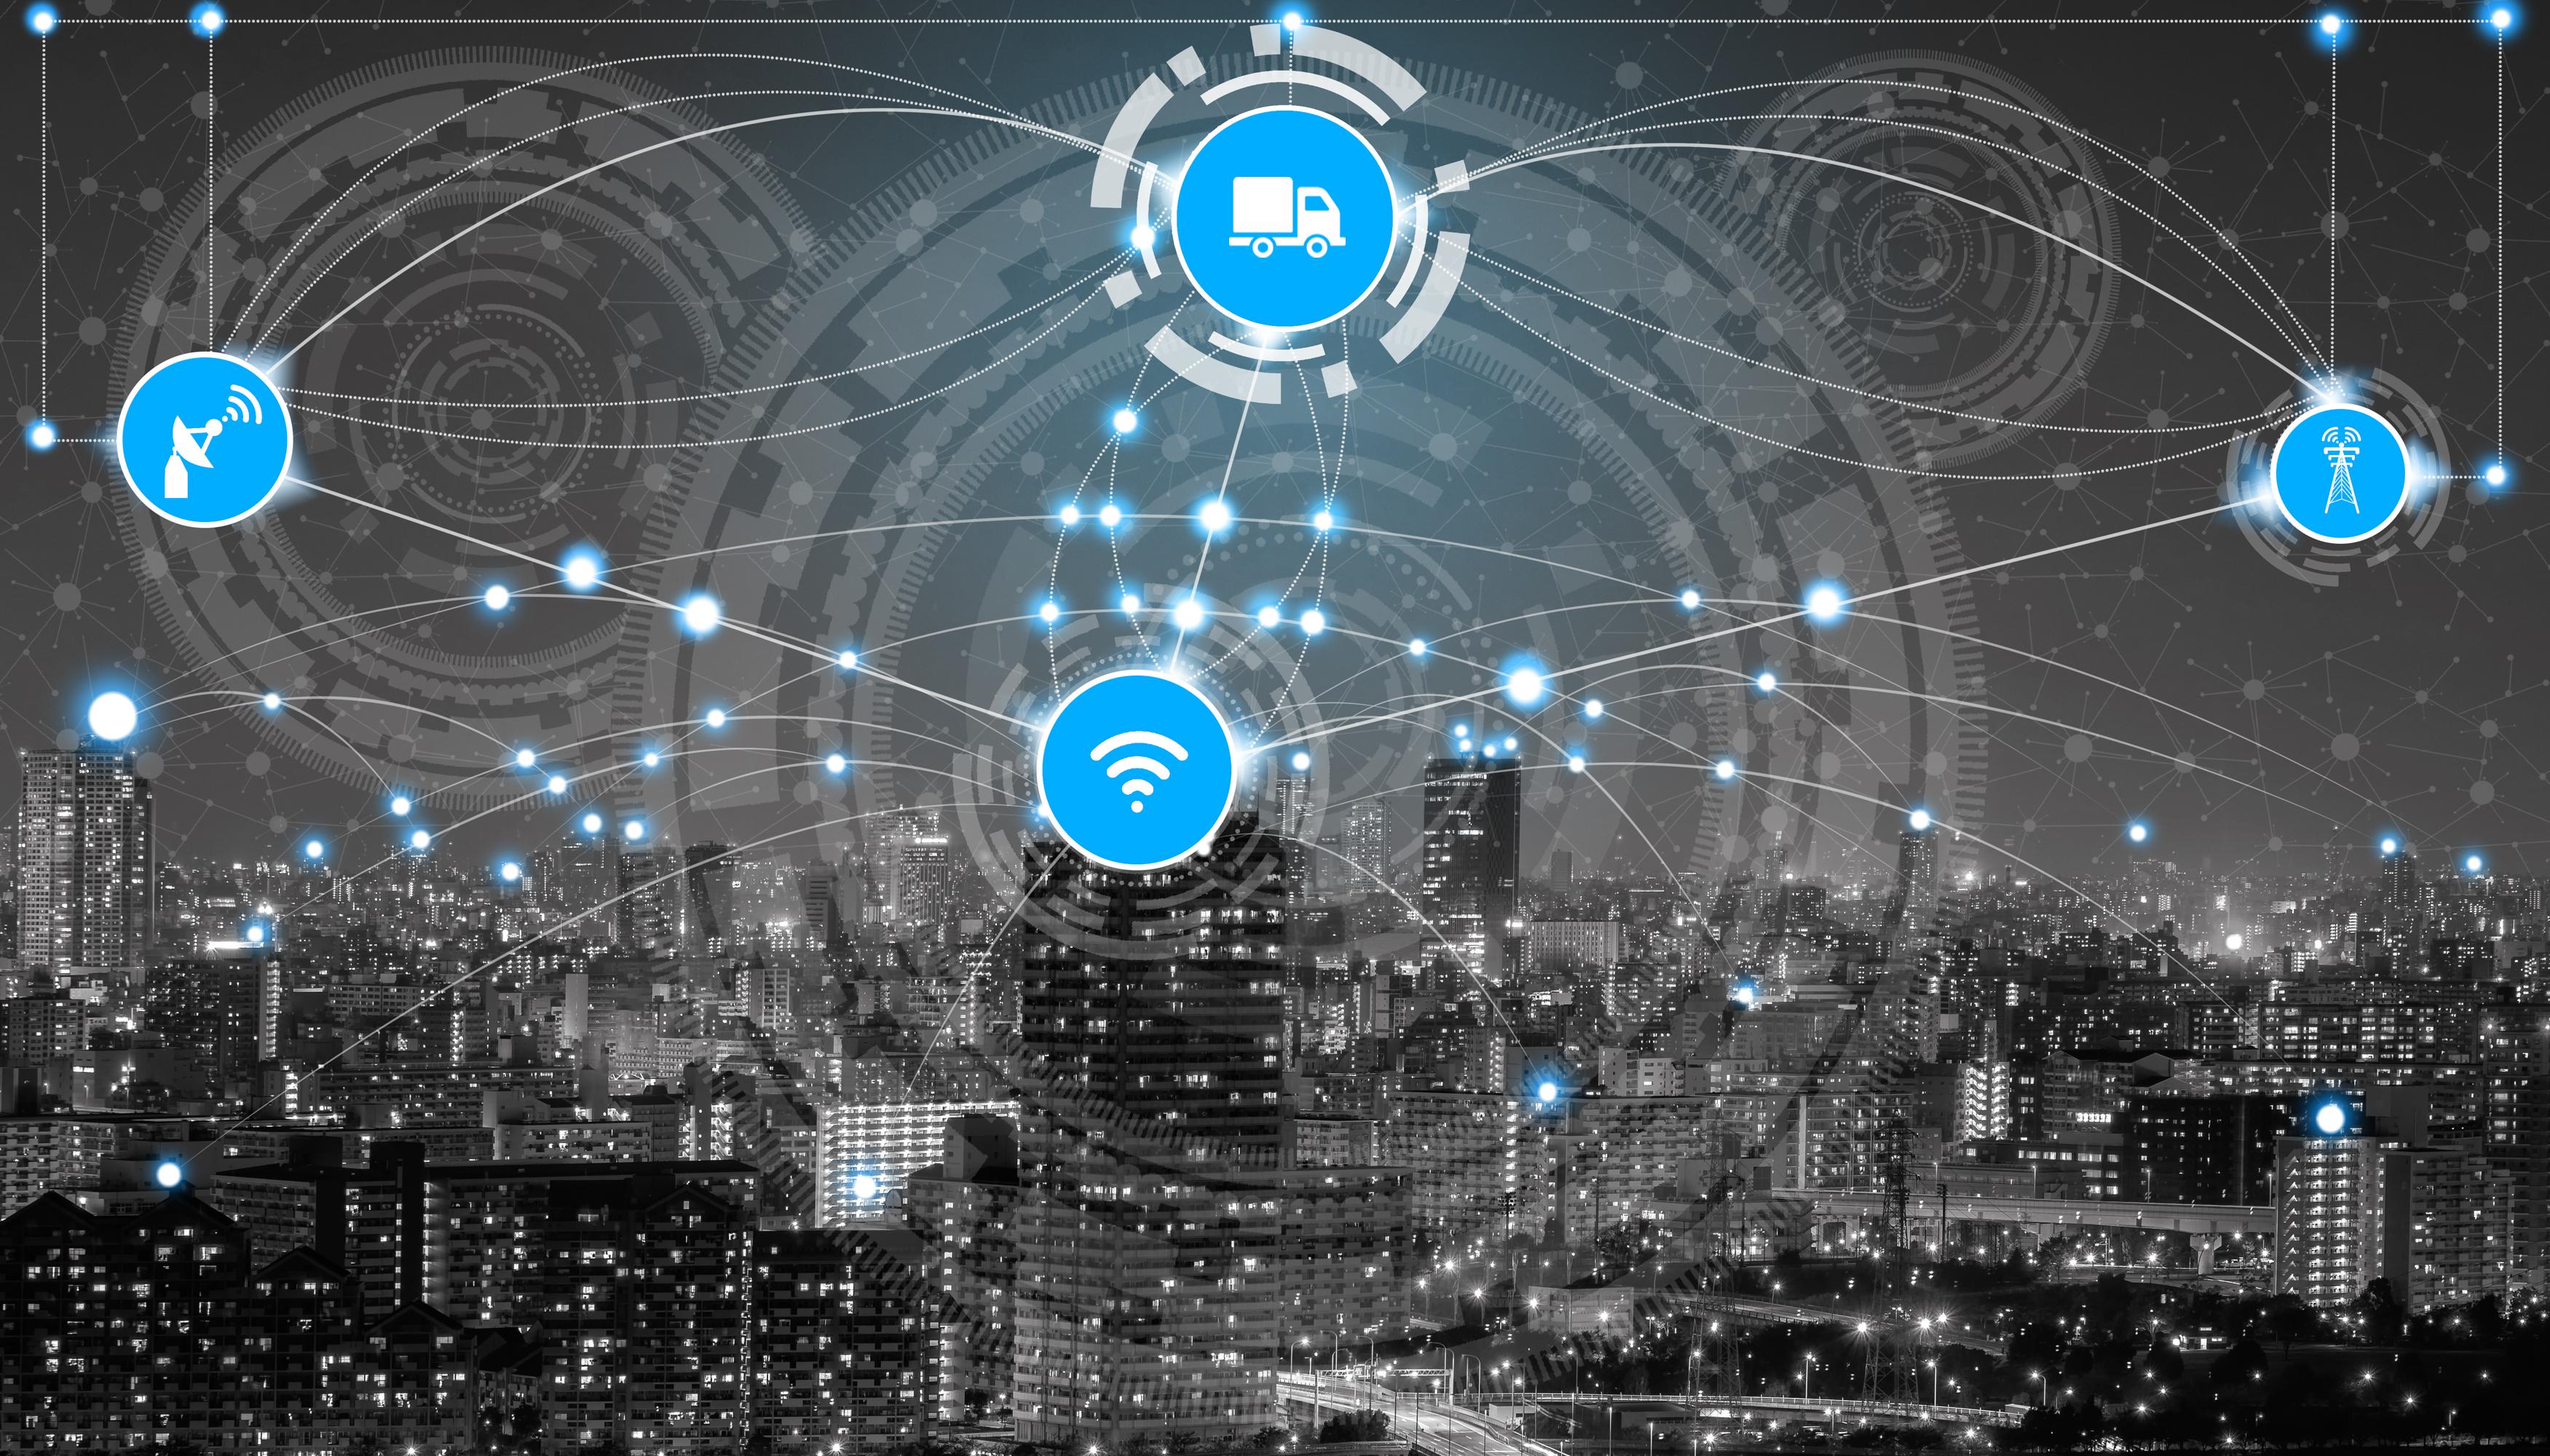 telematics, smart city, waste management, smart cities